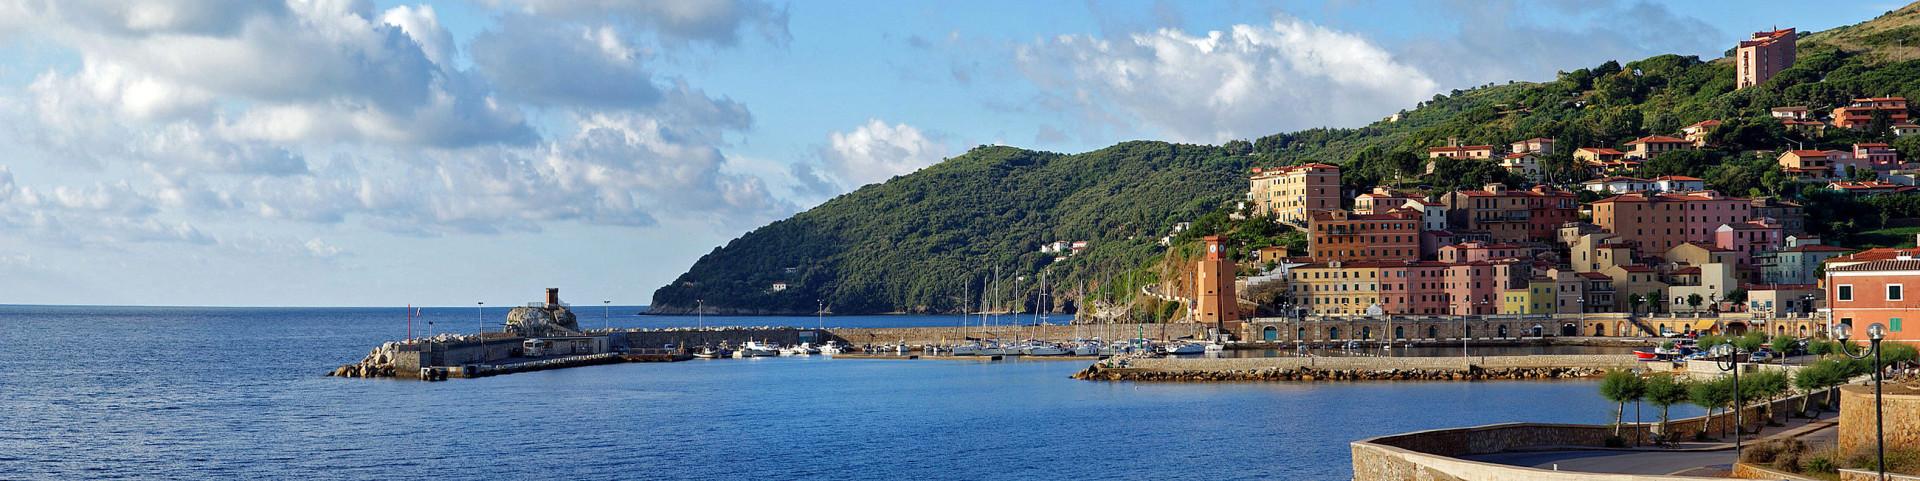 Rio Marina a přístav